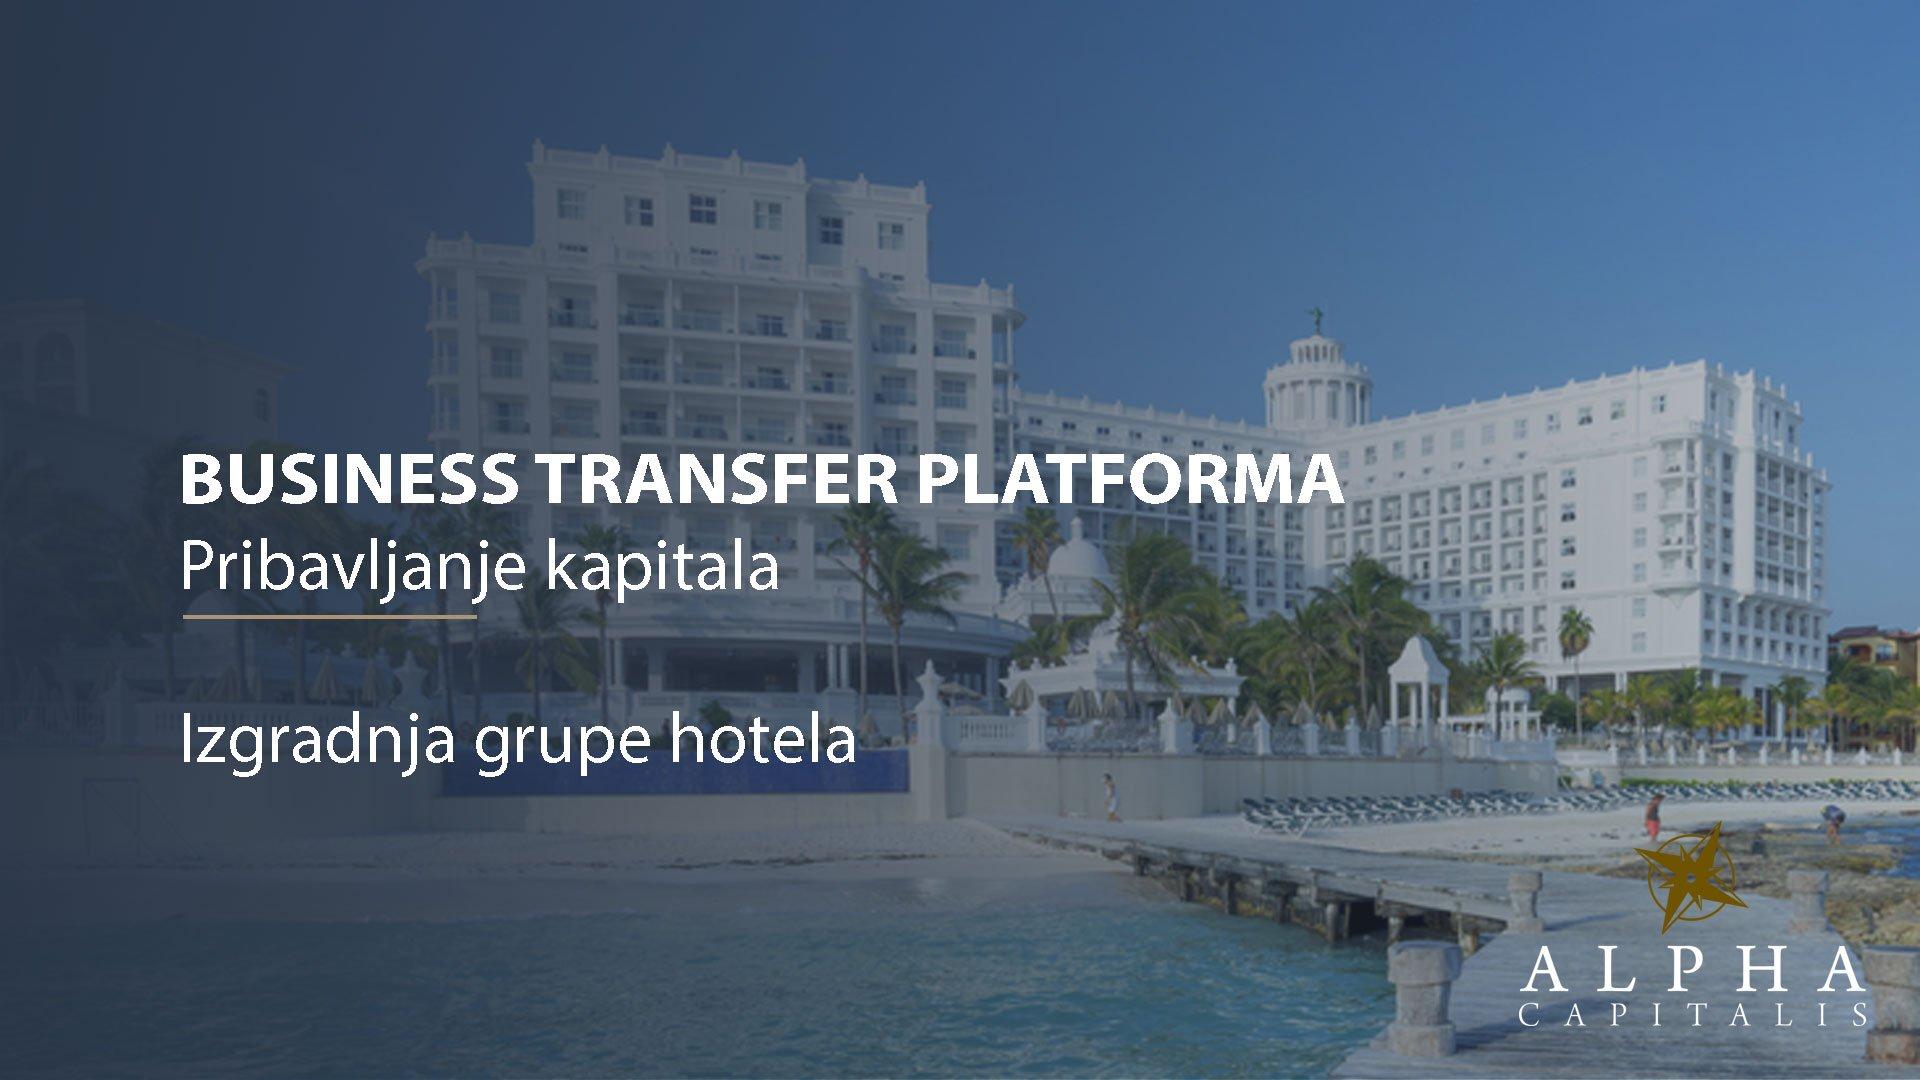 Business-transfer-platforma-pribavljanje-kapitala-izgradnja-grupe-hotela